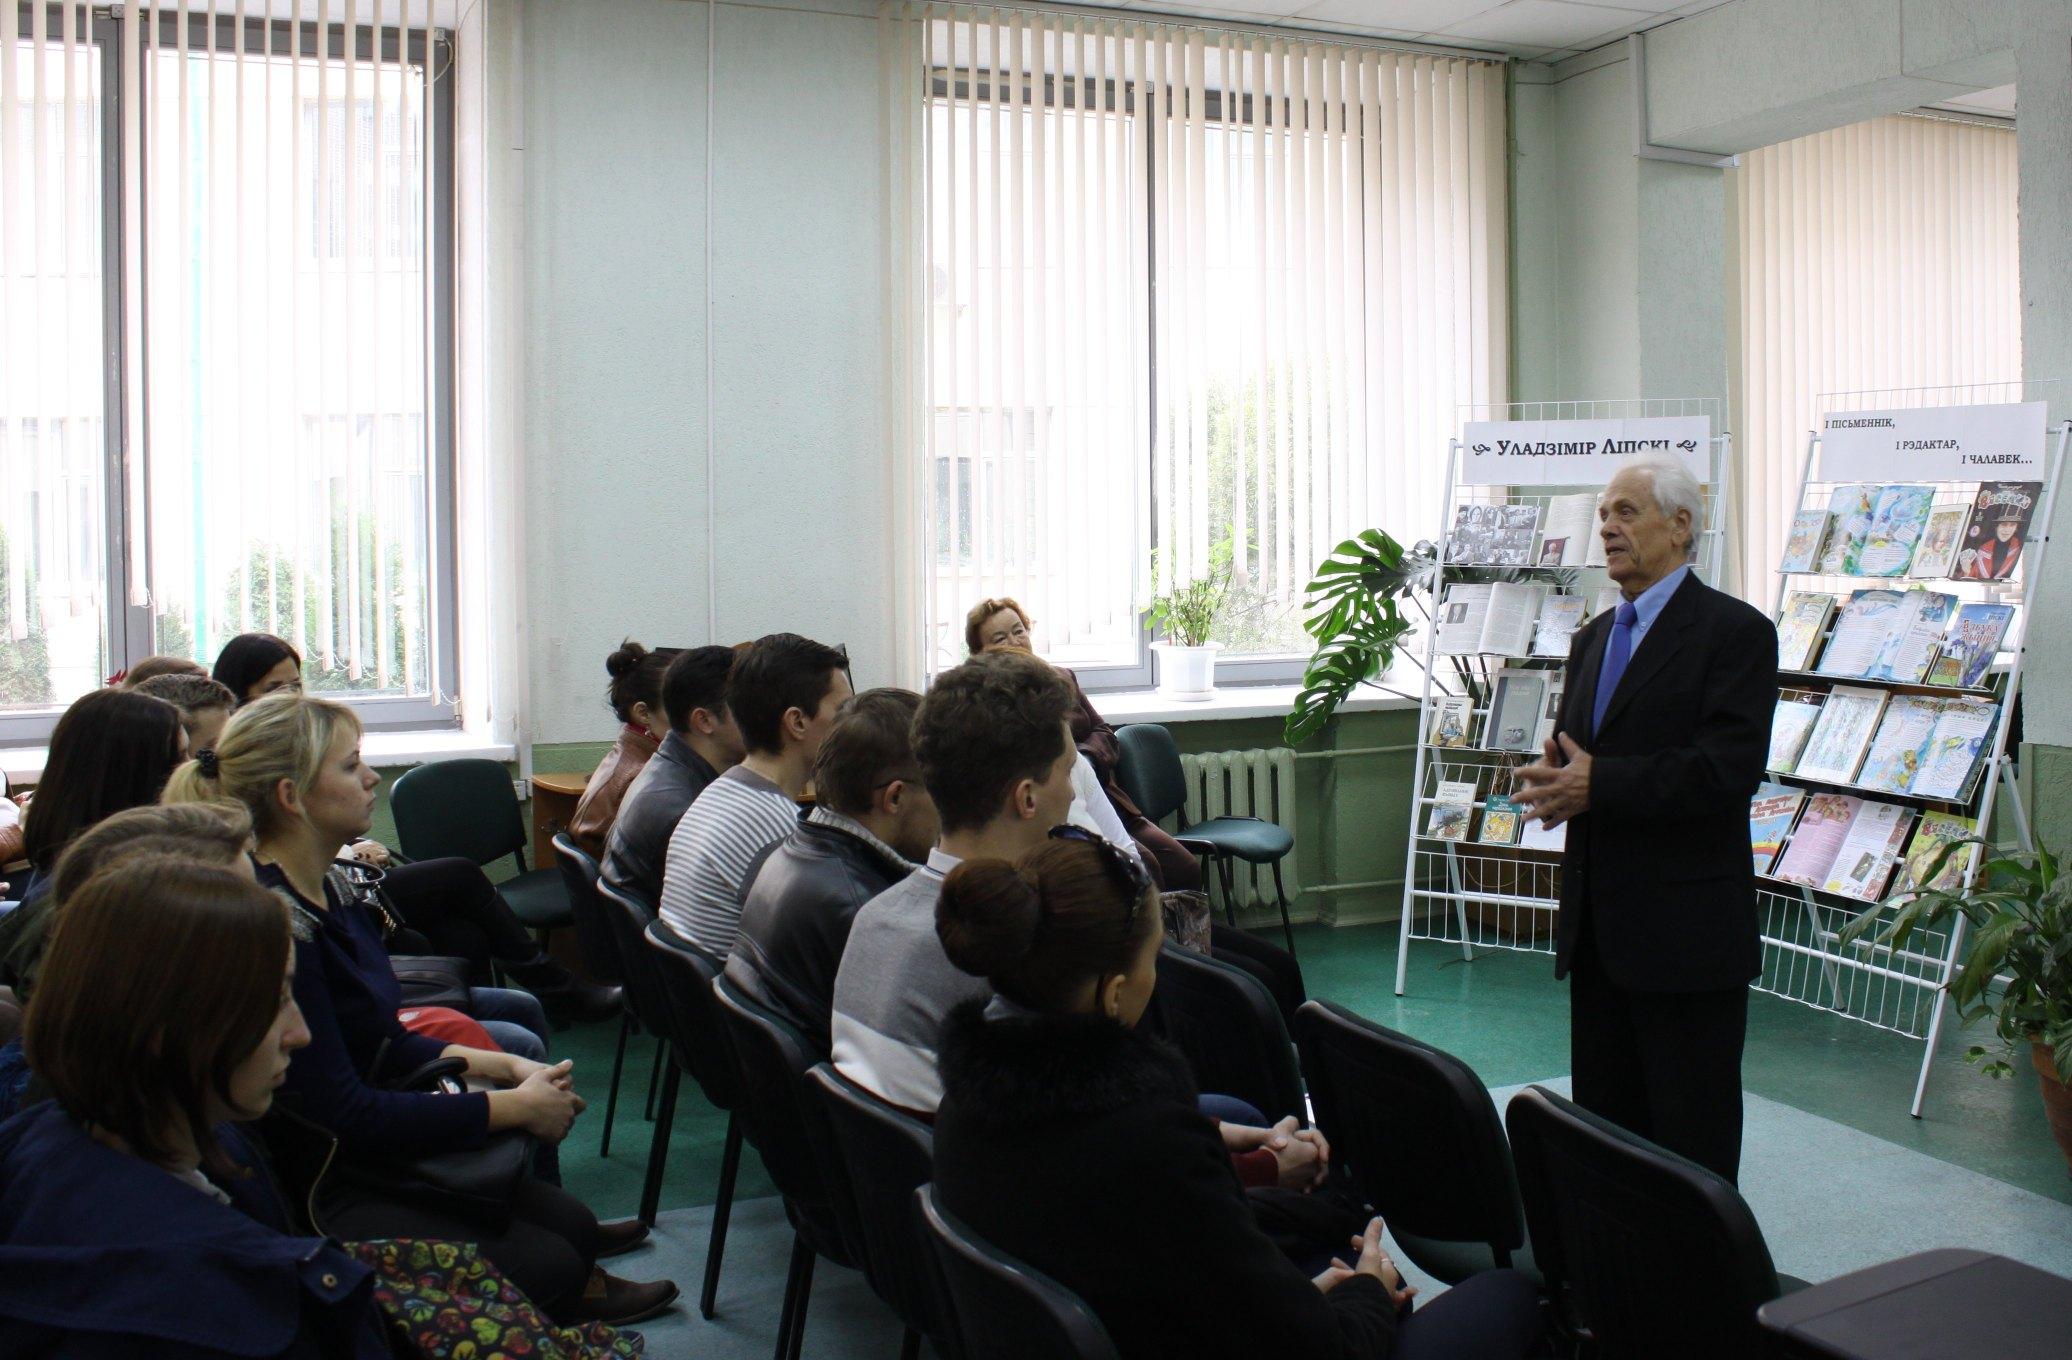 Встреча с В.С.Липским студентов 5 курса матфака БГПУ